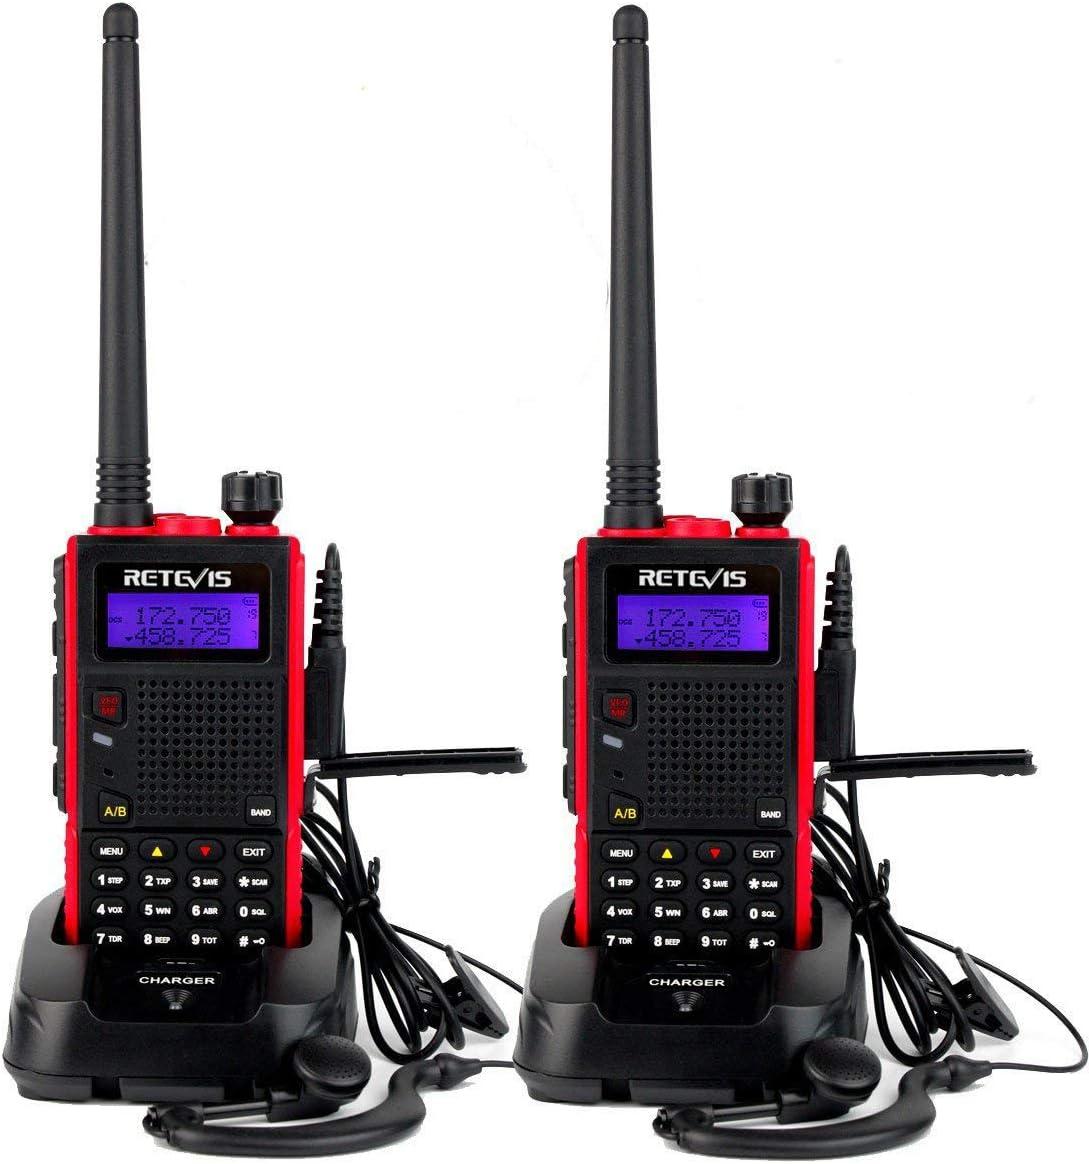 Retevis RT5 2way Radios Long Range, VHF/UHF Dual Band Radio, VOX FM Emergency Two Way Radio (Red, 2 Pack)